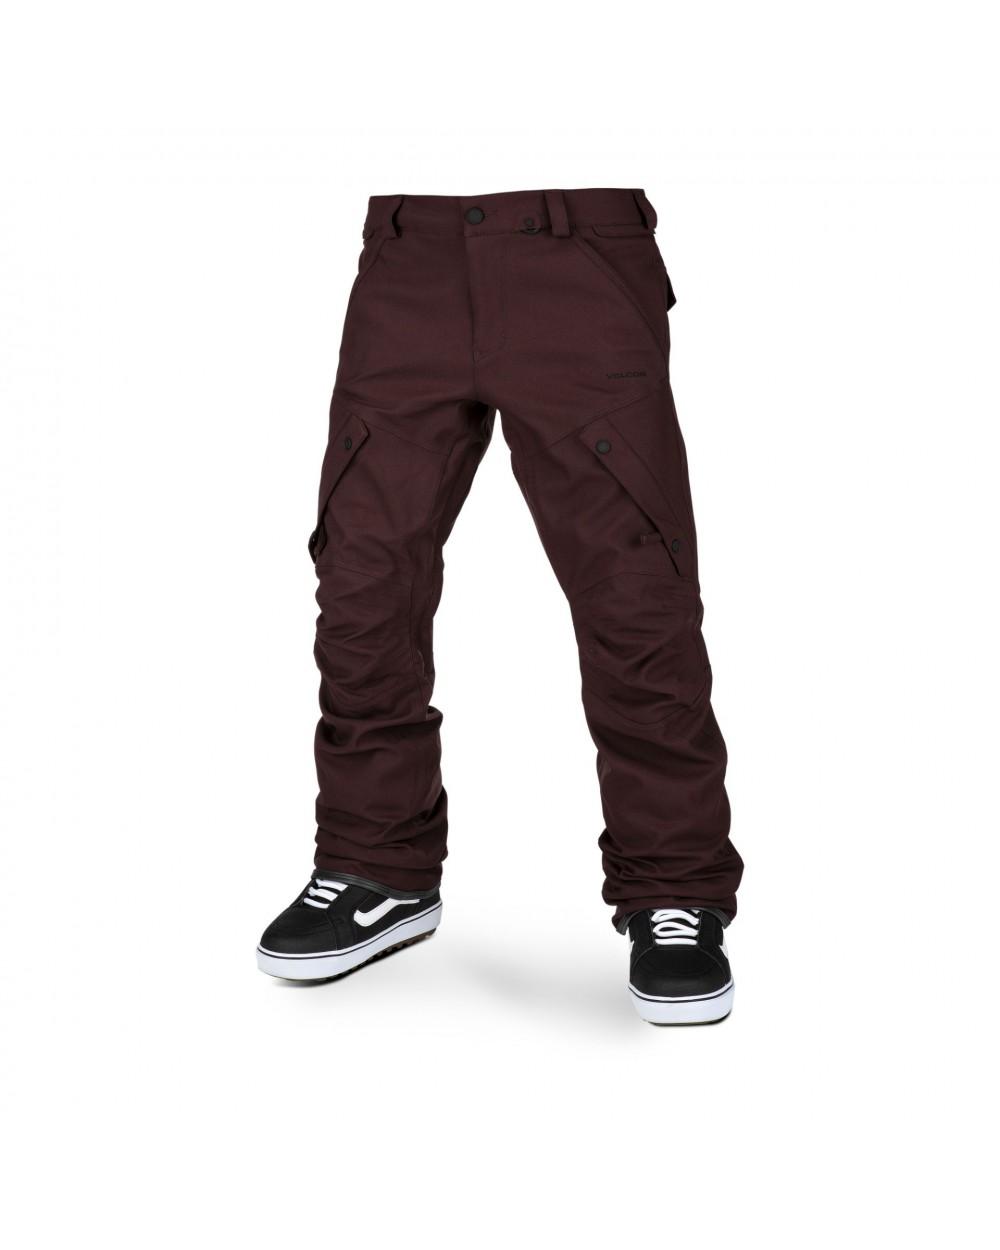 Volcom Snow Articulated  Pants - Burned Brick